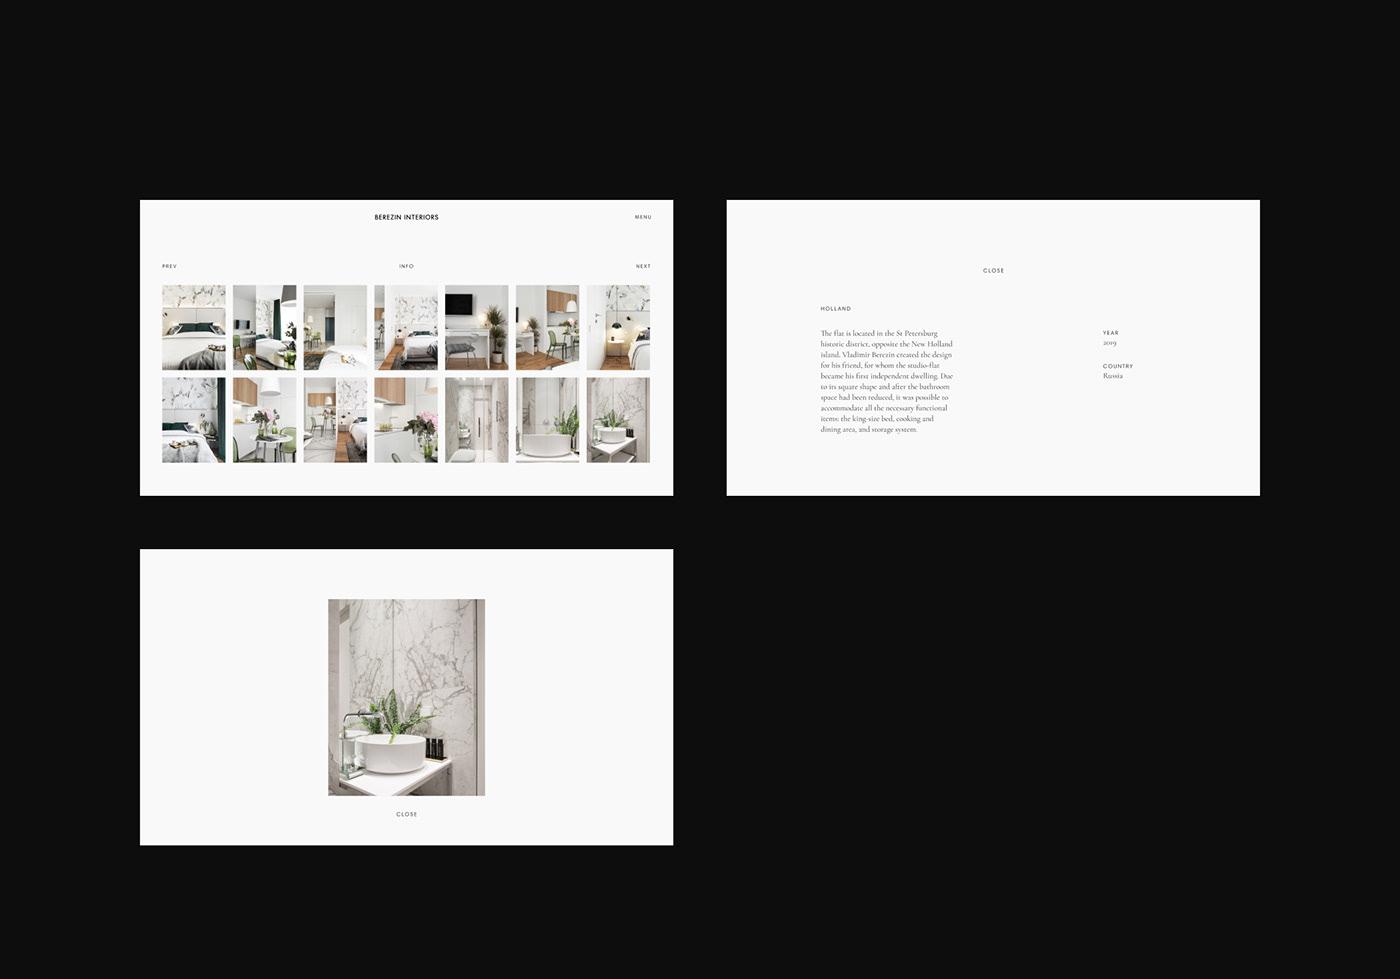 architecture Architecture website Designer Portfolio interior design  interior design website interior designer Minimalism minimalist web design minimalist website white design